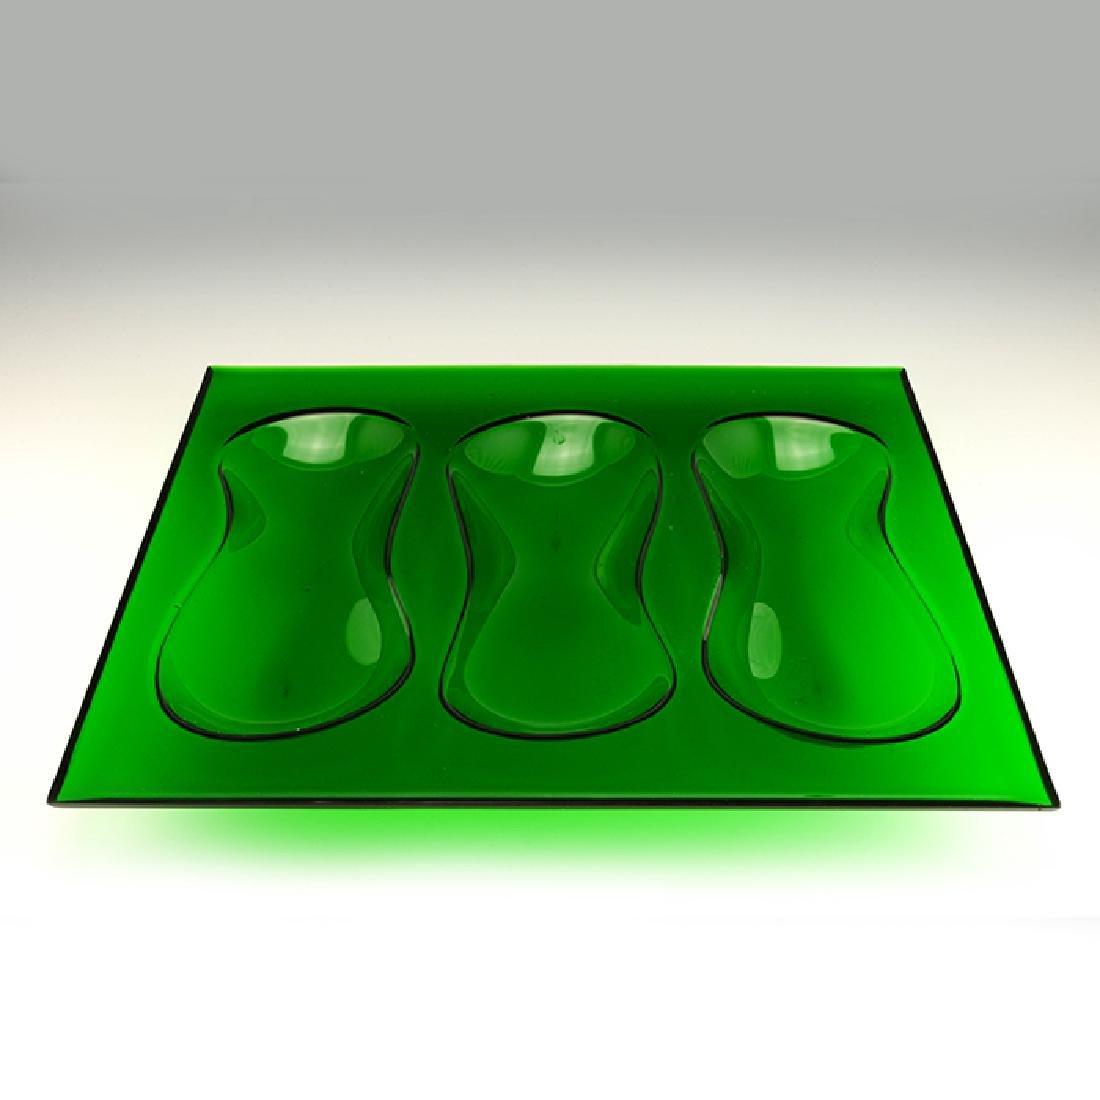 Eva Zeisel, Rare Cloverware Gourd Tray in Green - 2